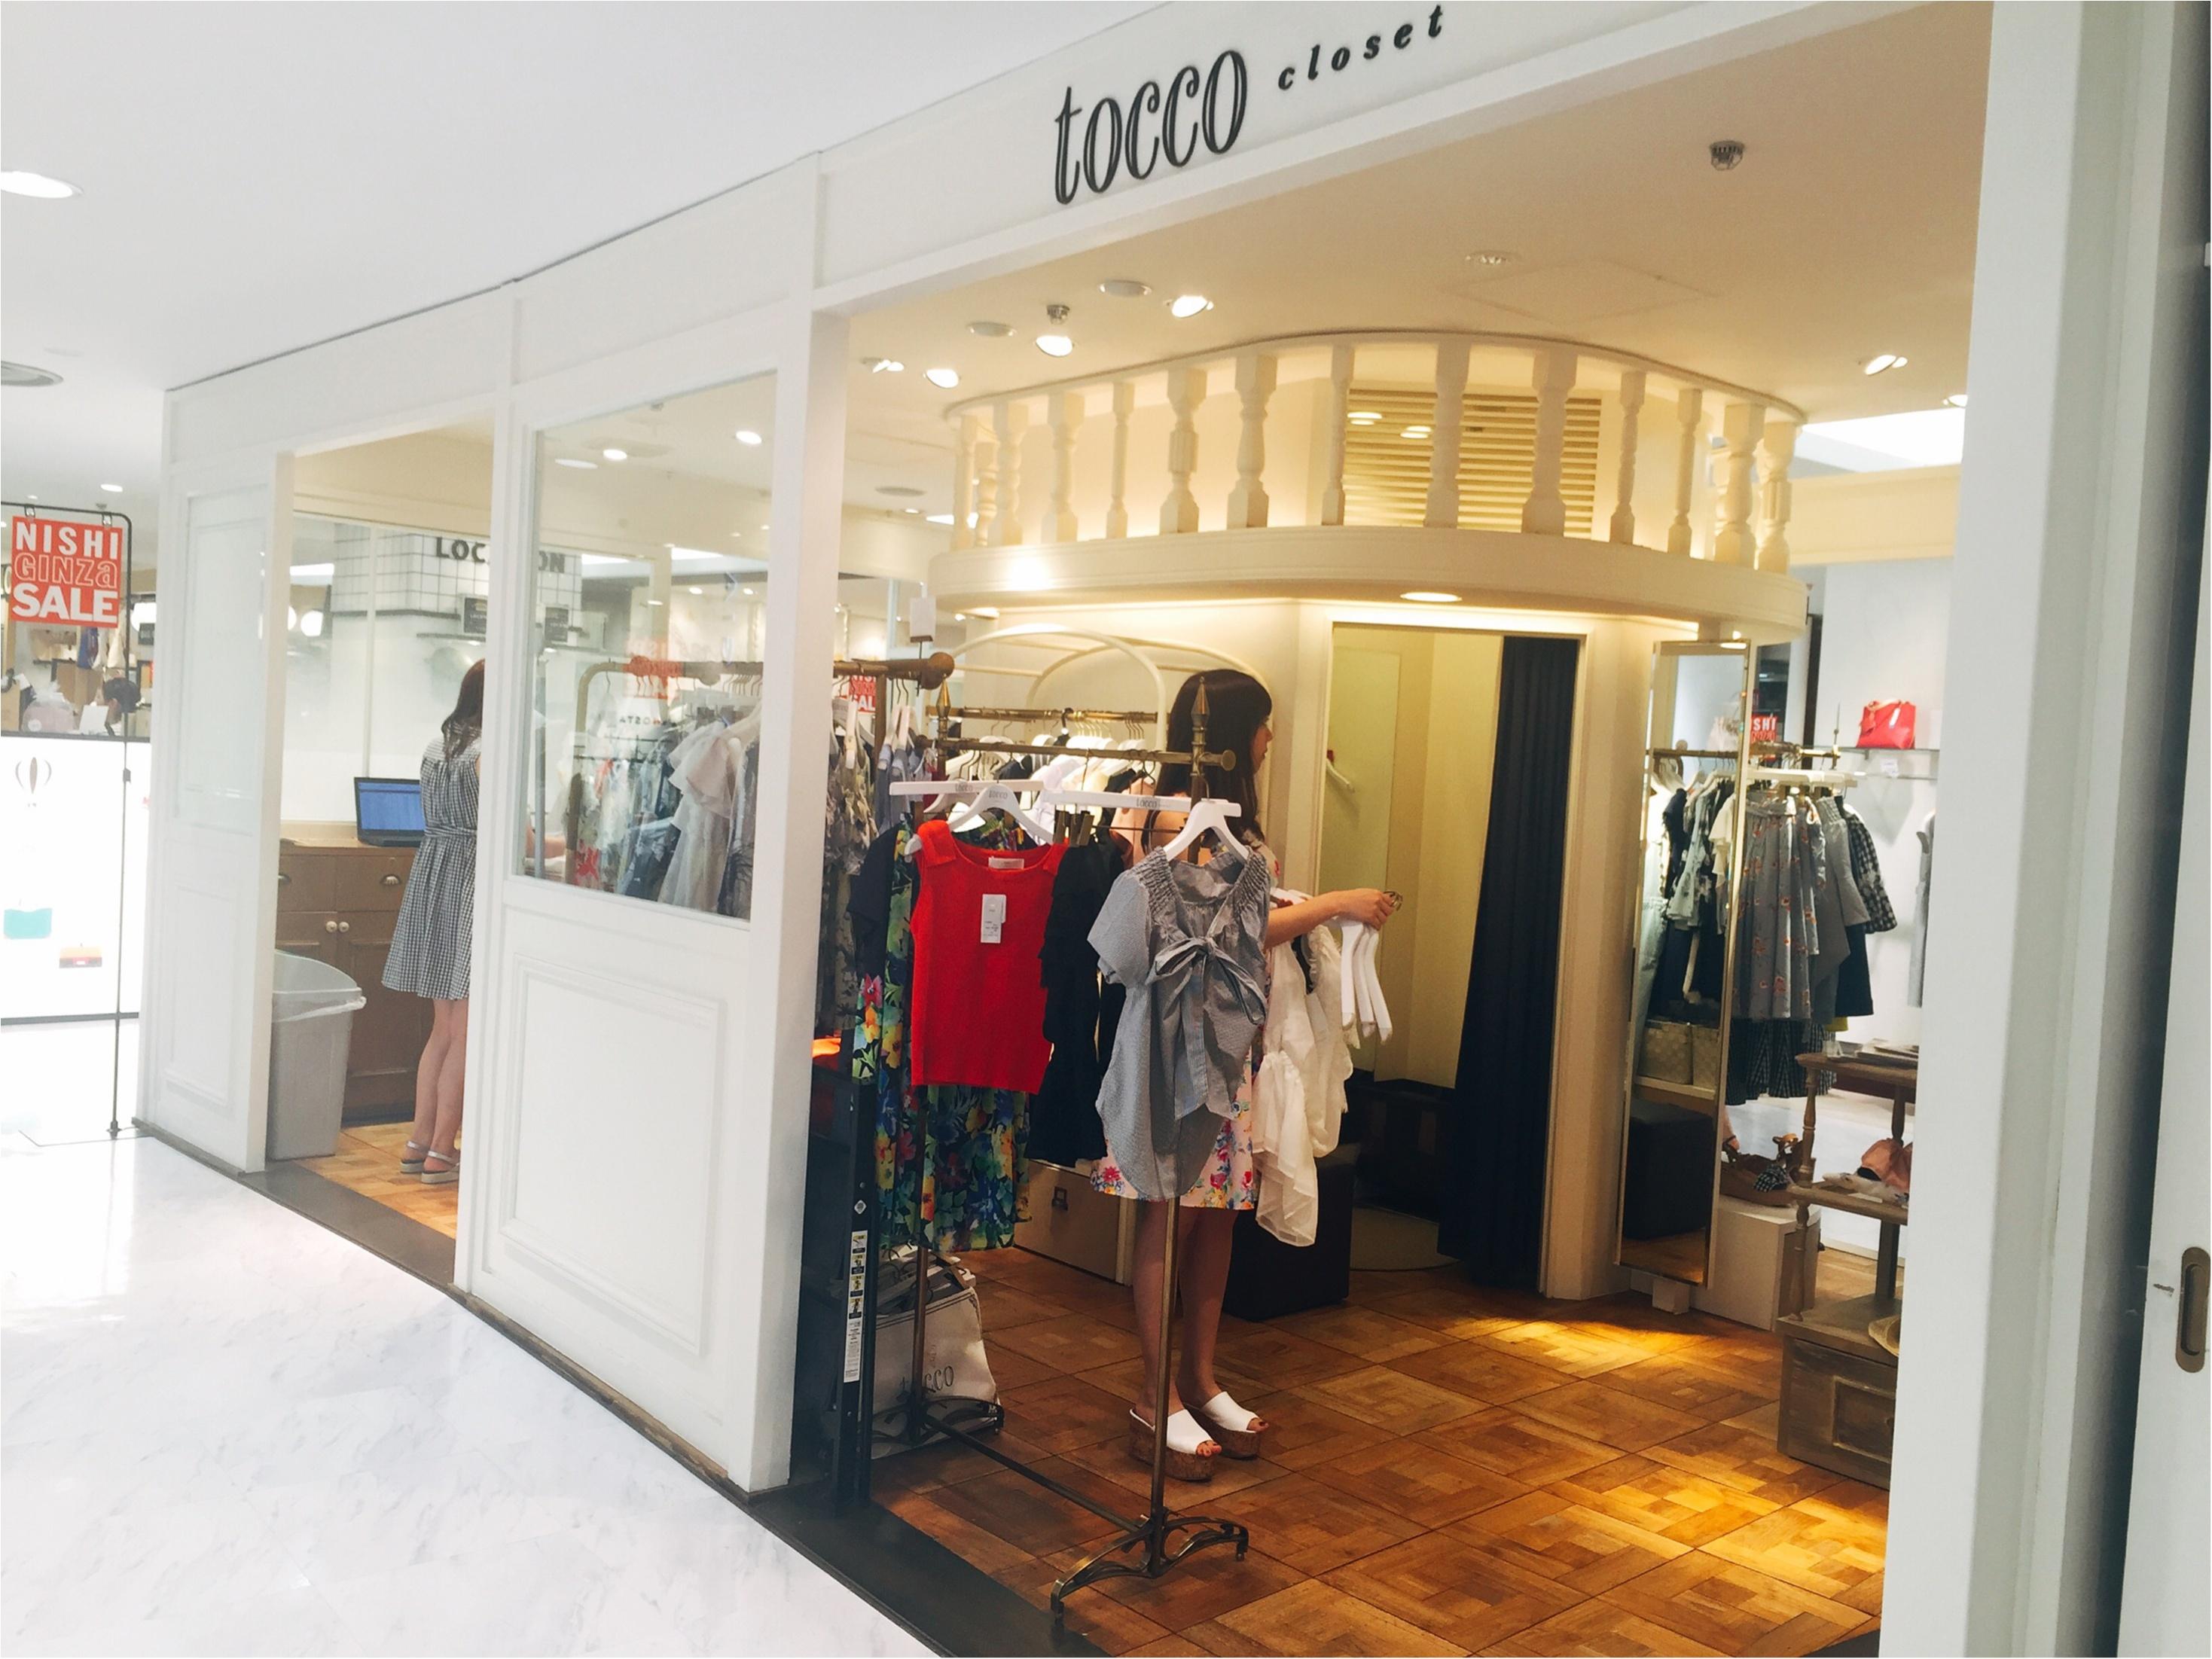 toccoのセール!2017年トレンド「刺繍入り」サンダルを購入したよ♡驚きのプチプライス¥3,000台なのです♩_5